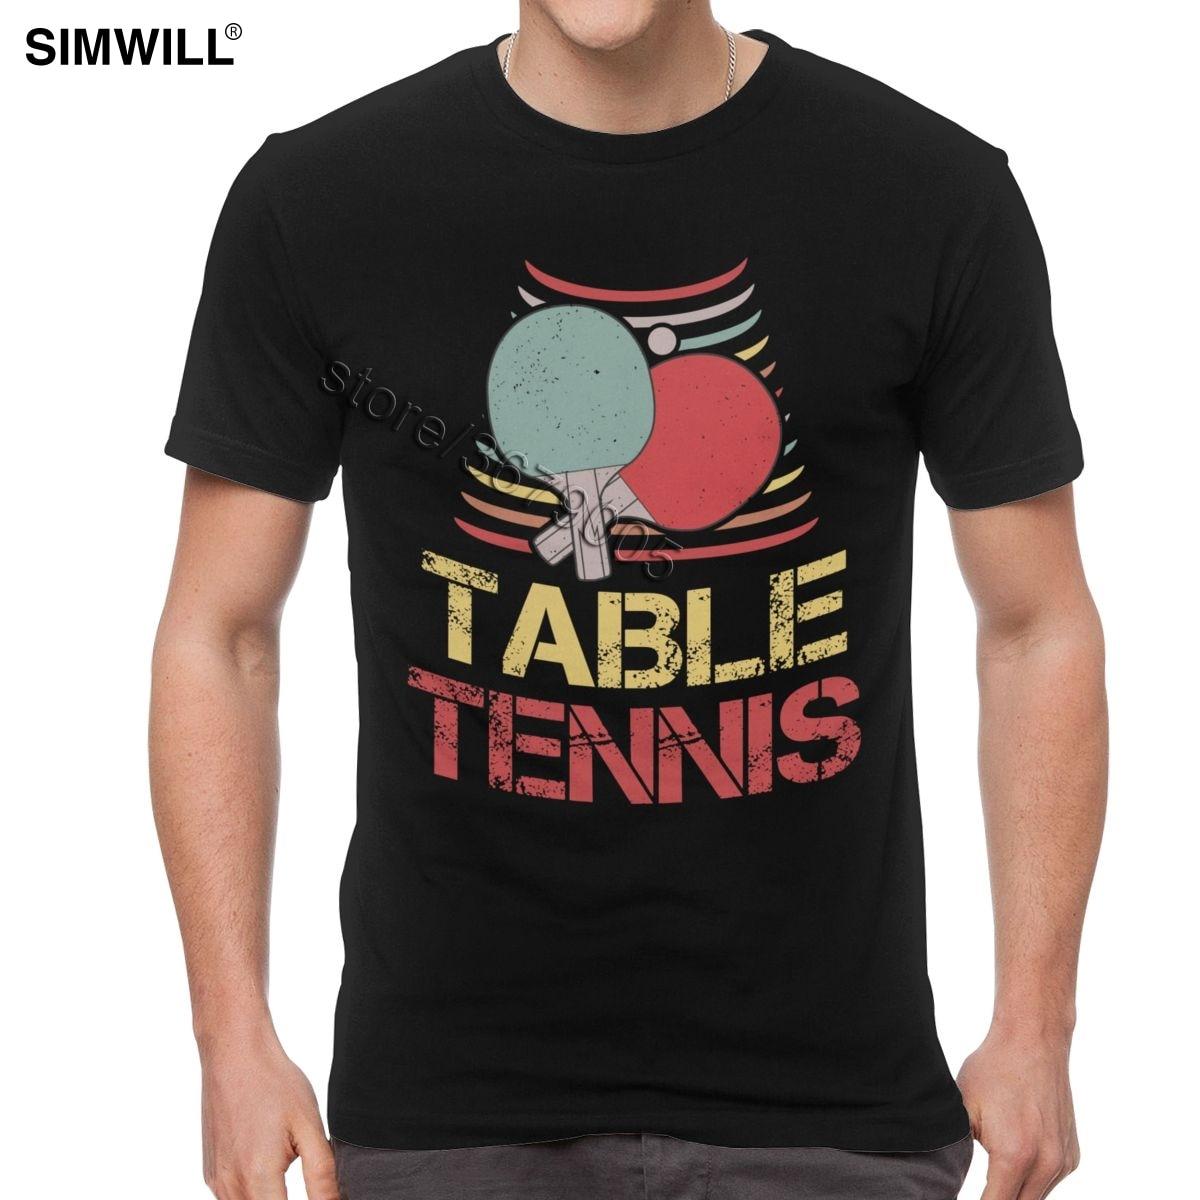 Vintage Table Tennis T Shirt Men Short Sleeve Cotton Ping Pong Tees Unique Casual Streetwear Summer T-Shirt Gift Idea Tops